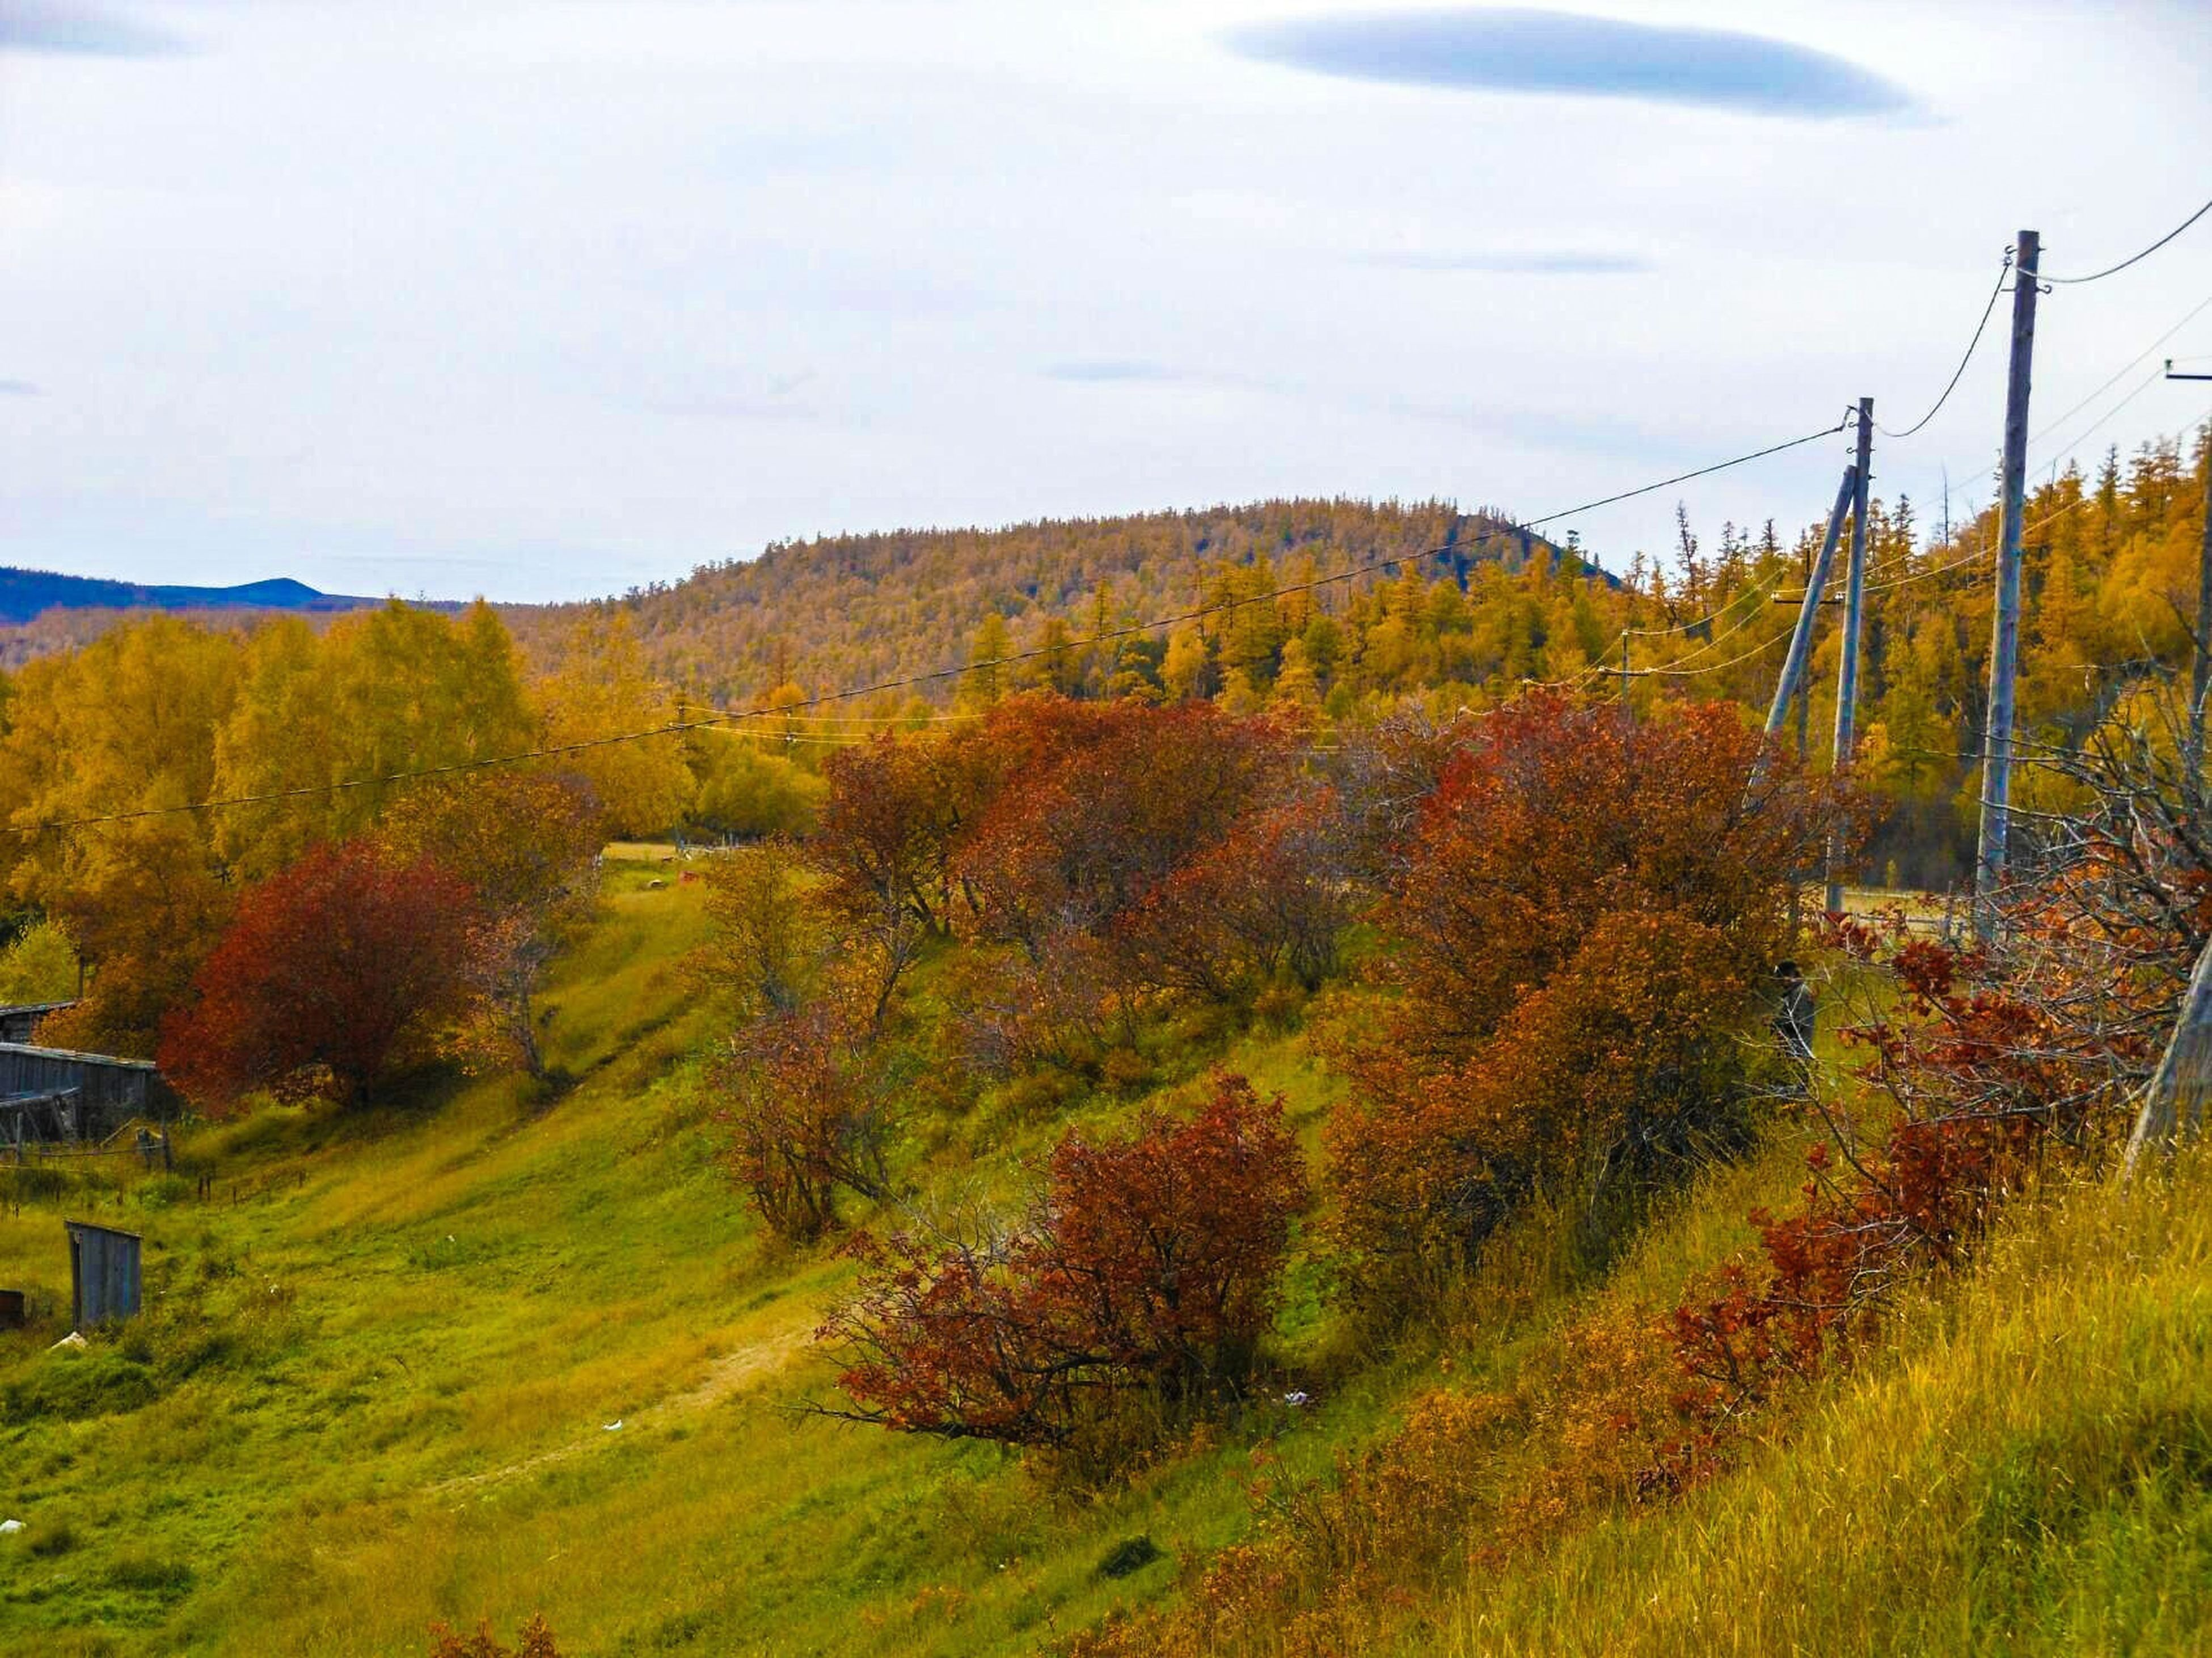 tree, landscape, mountain, tranquility, tranquil scene, autumn, sky, beauty in nature, scenics, grass, nature, growth, field, change, green color, non-urban scene, season, hill, grassy, idyllic